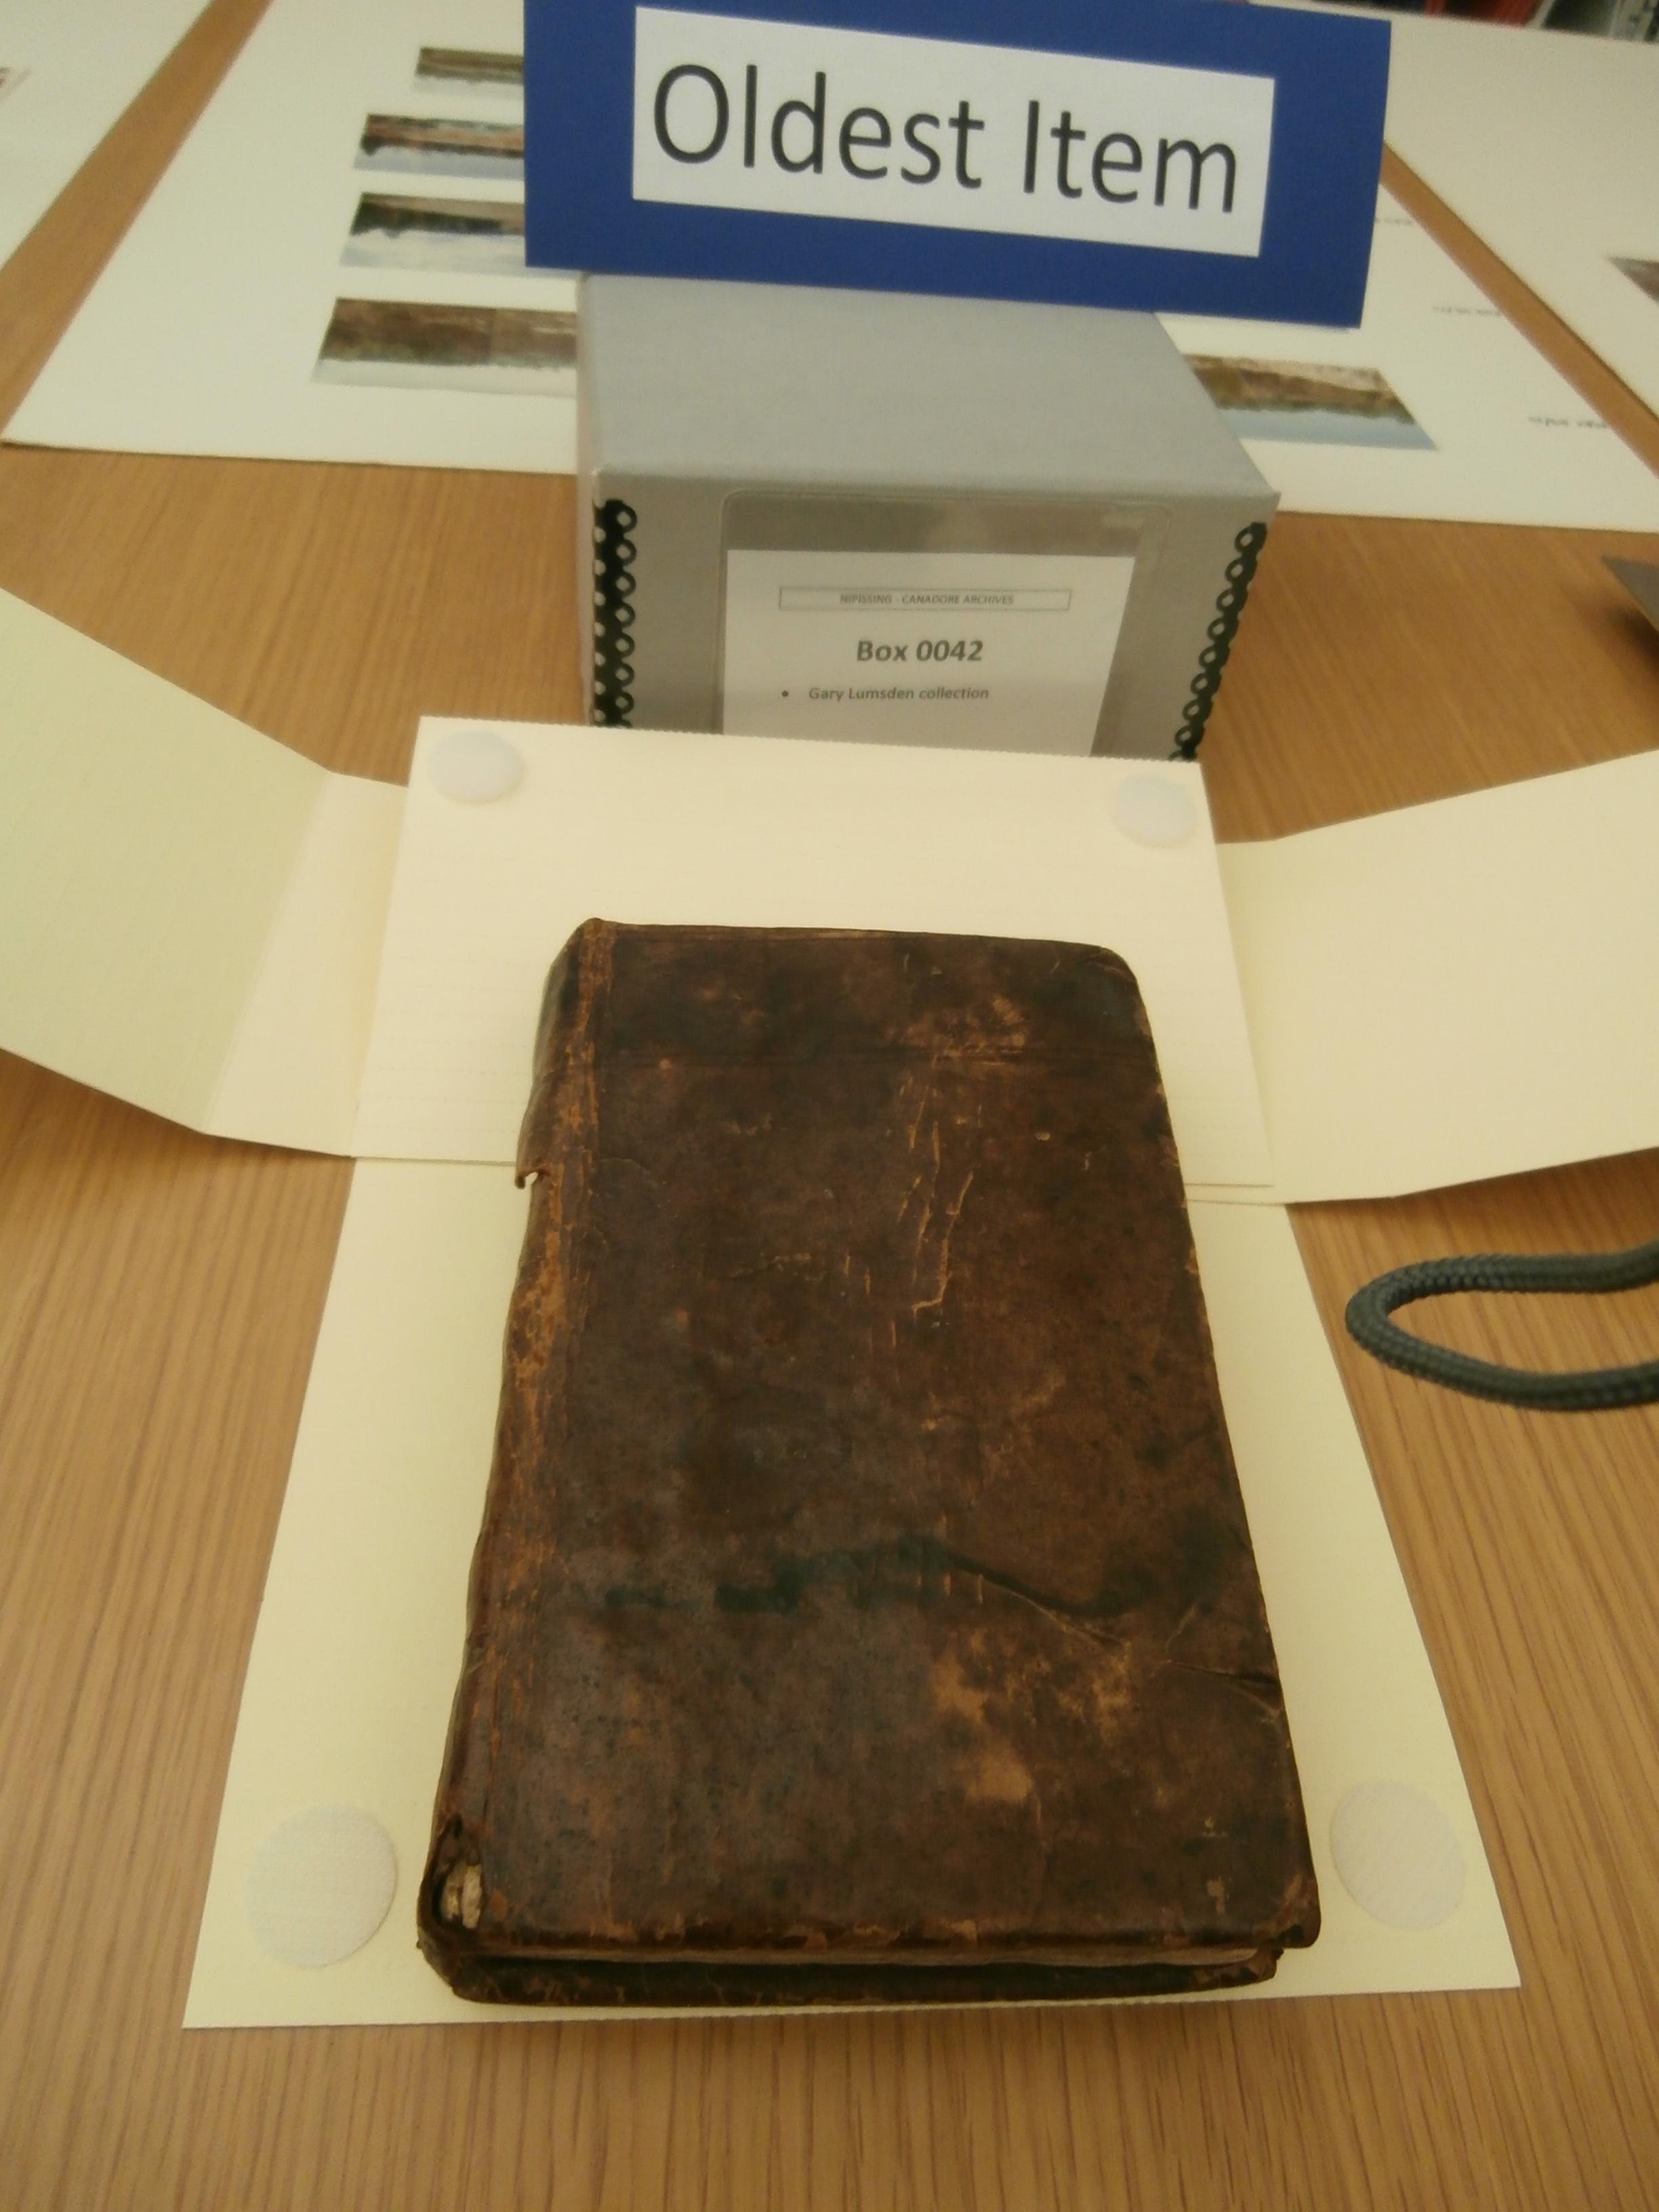 Oldest Item - Book